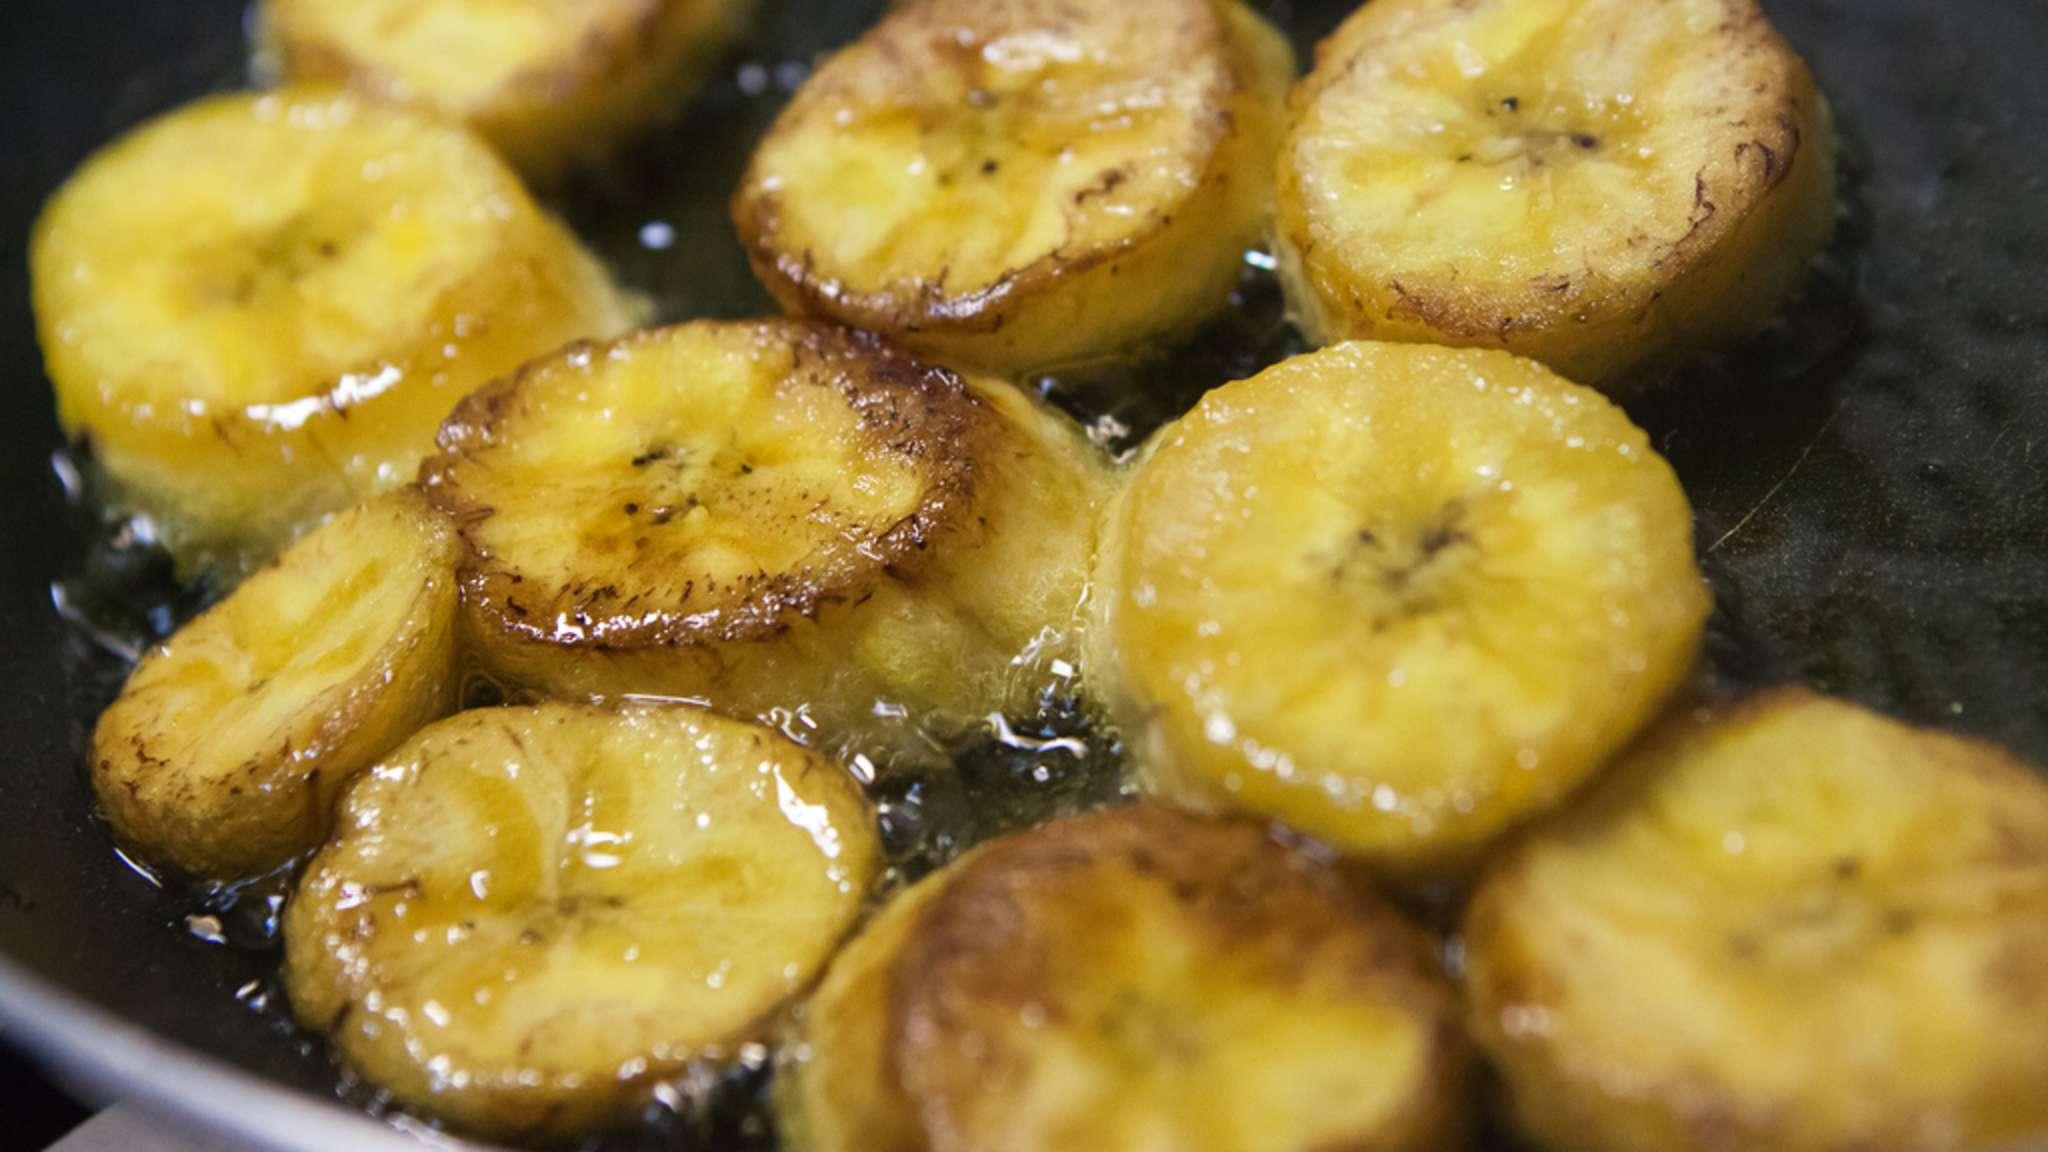 Banane plantain frite ou sautée